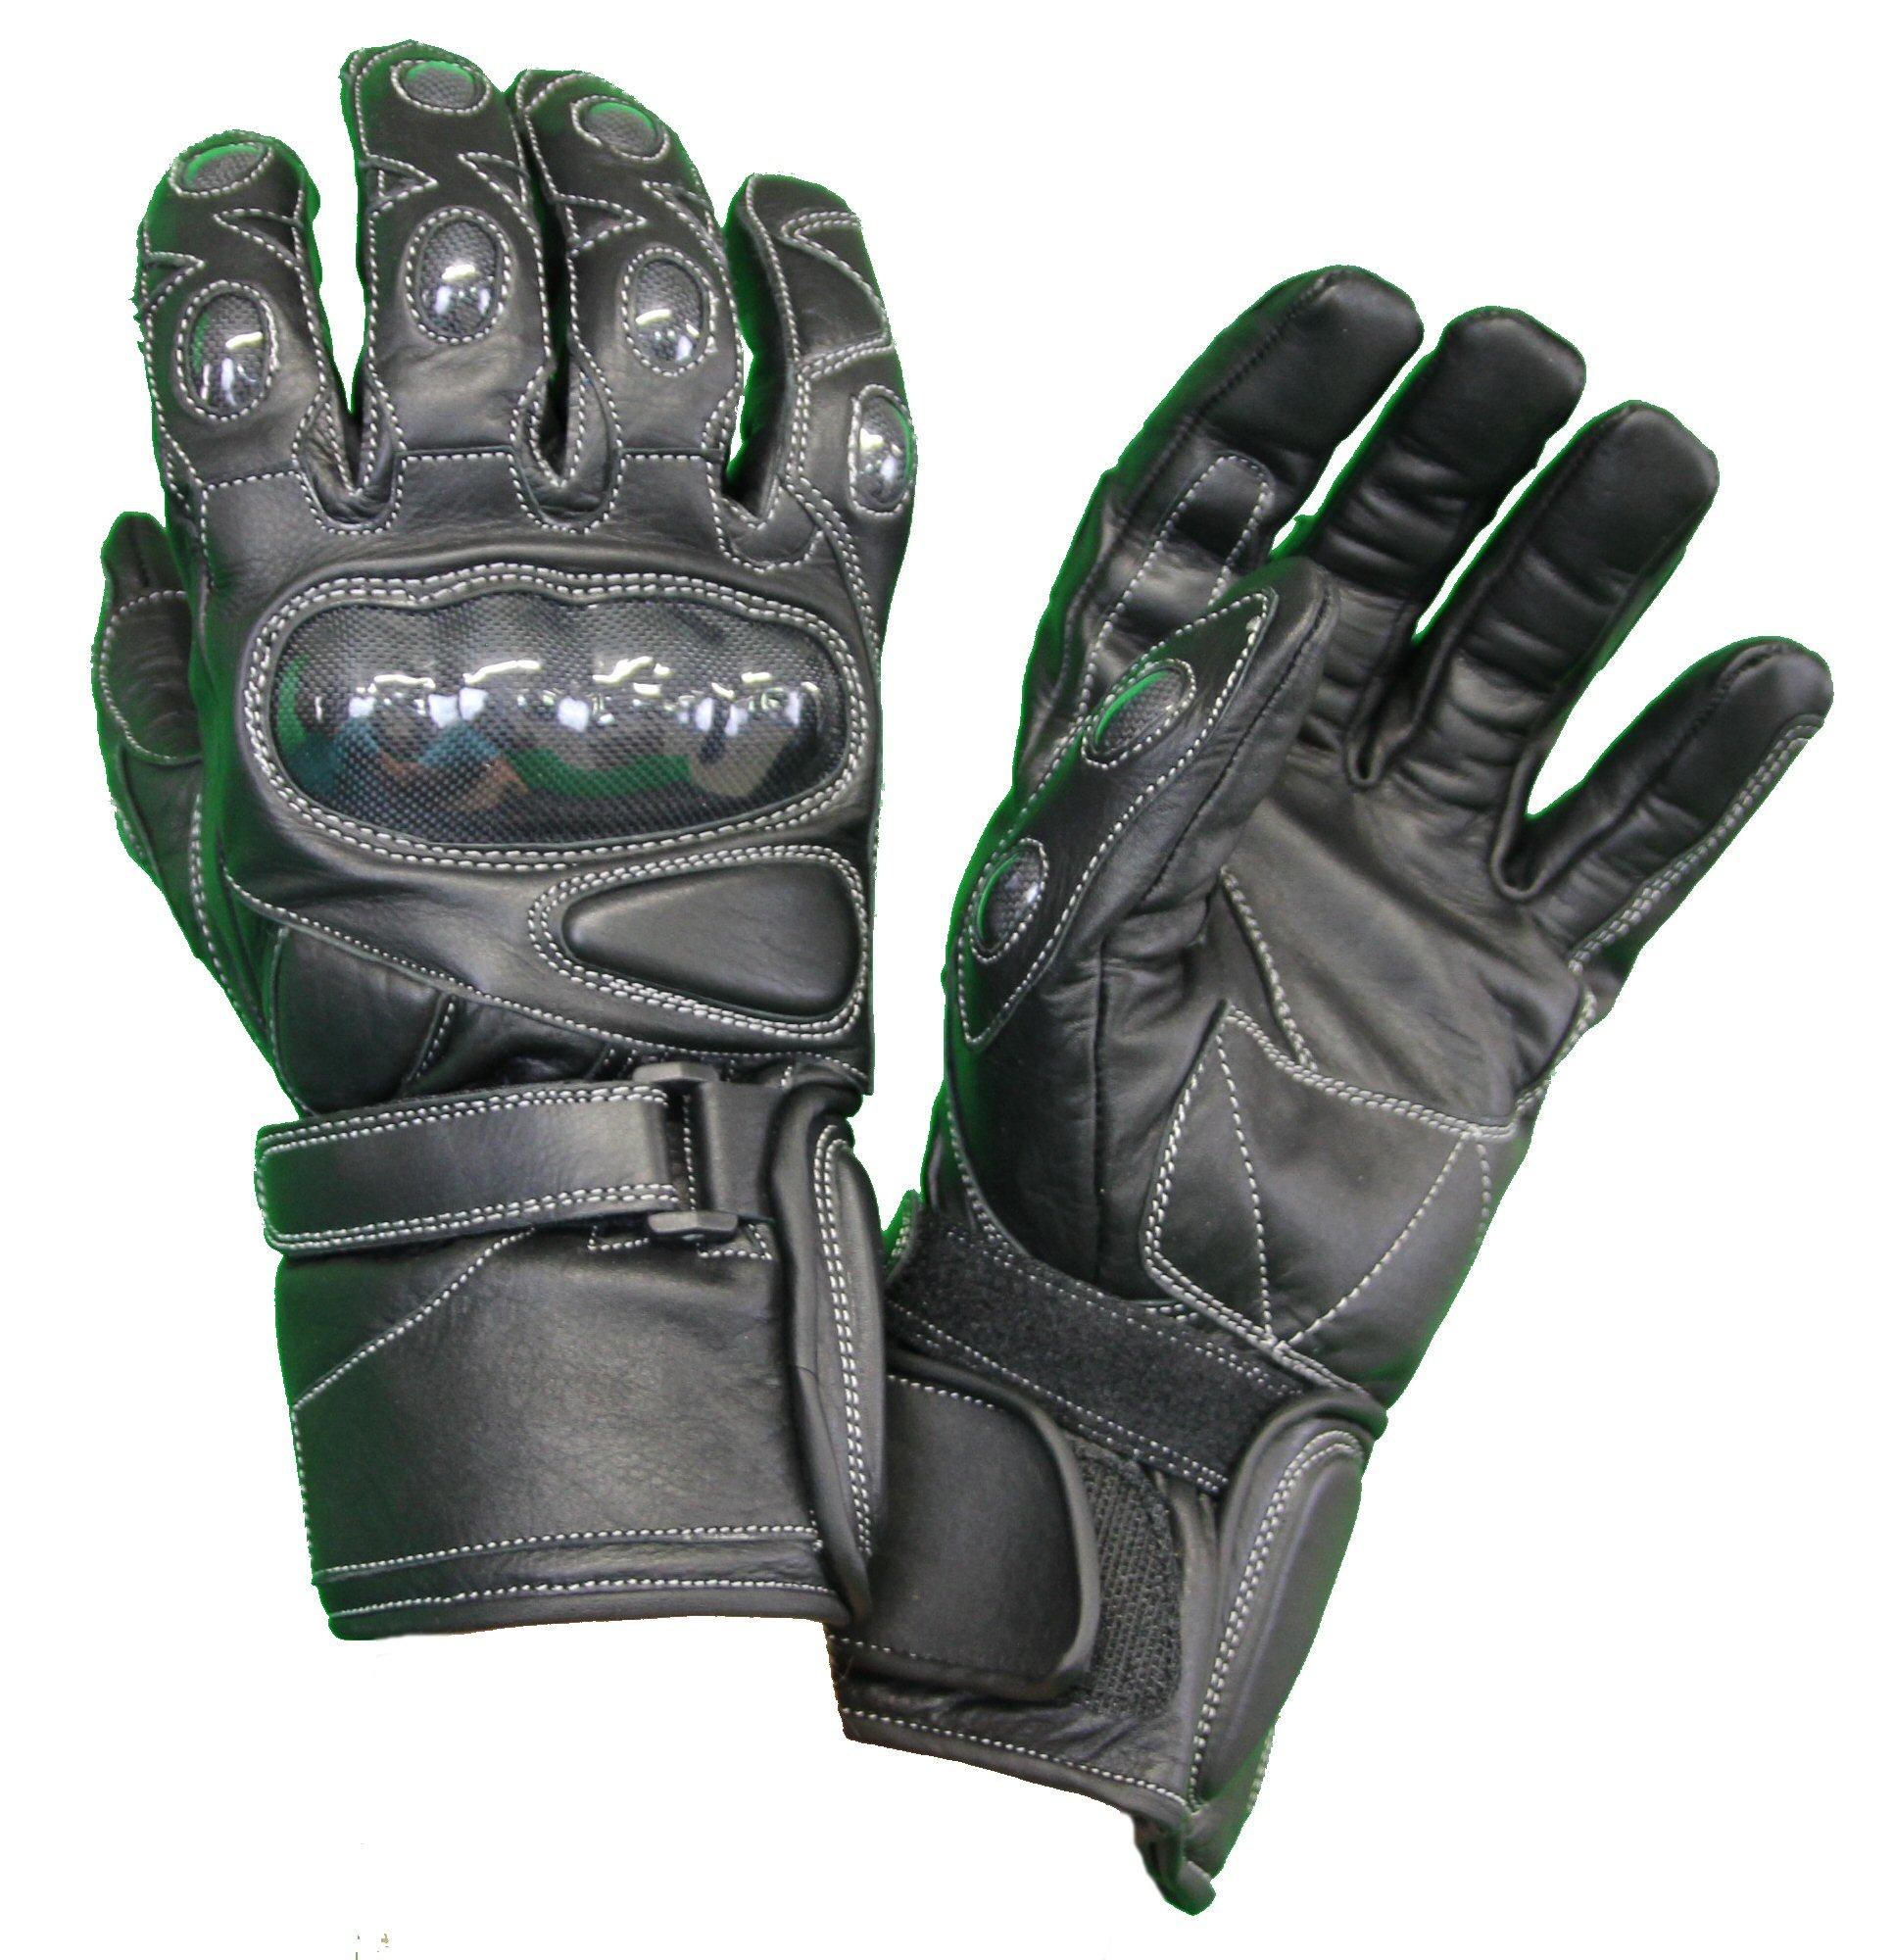 Kc401_1 gants moto noirs